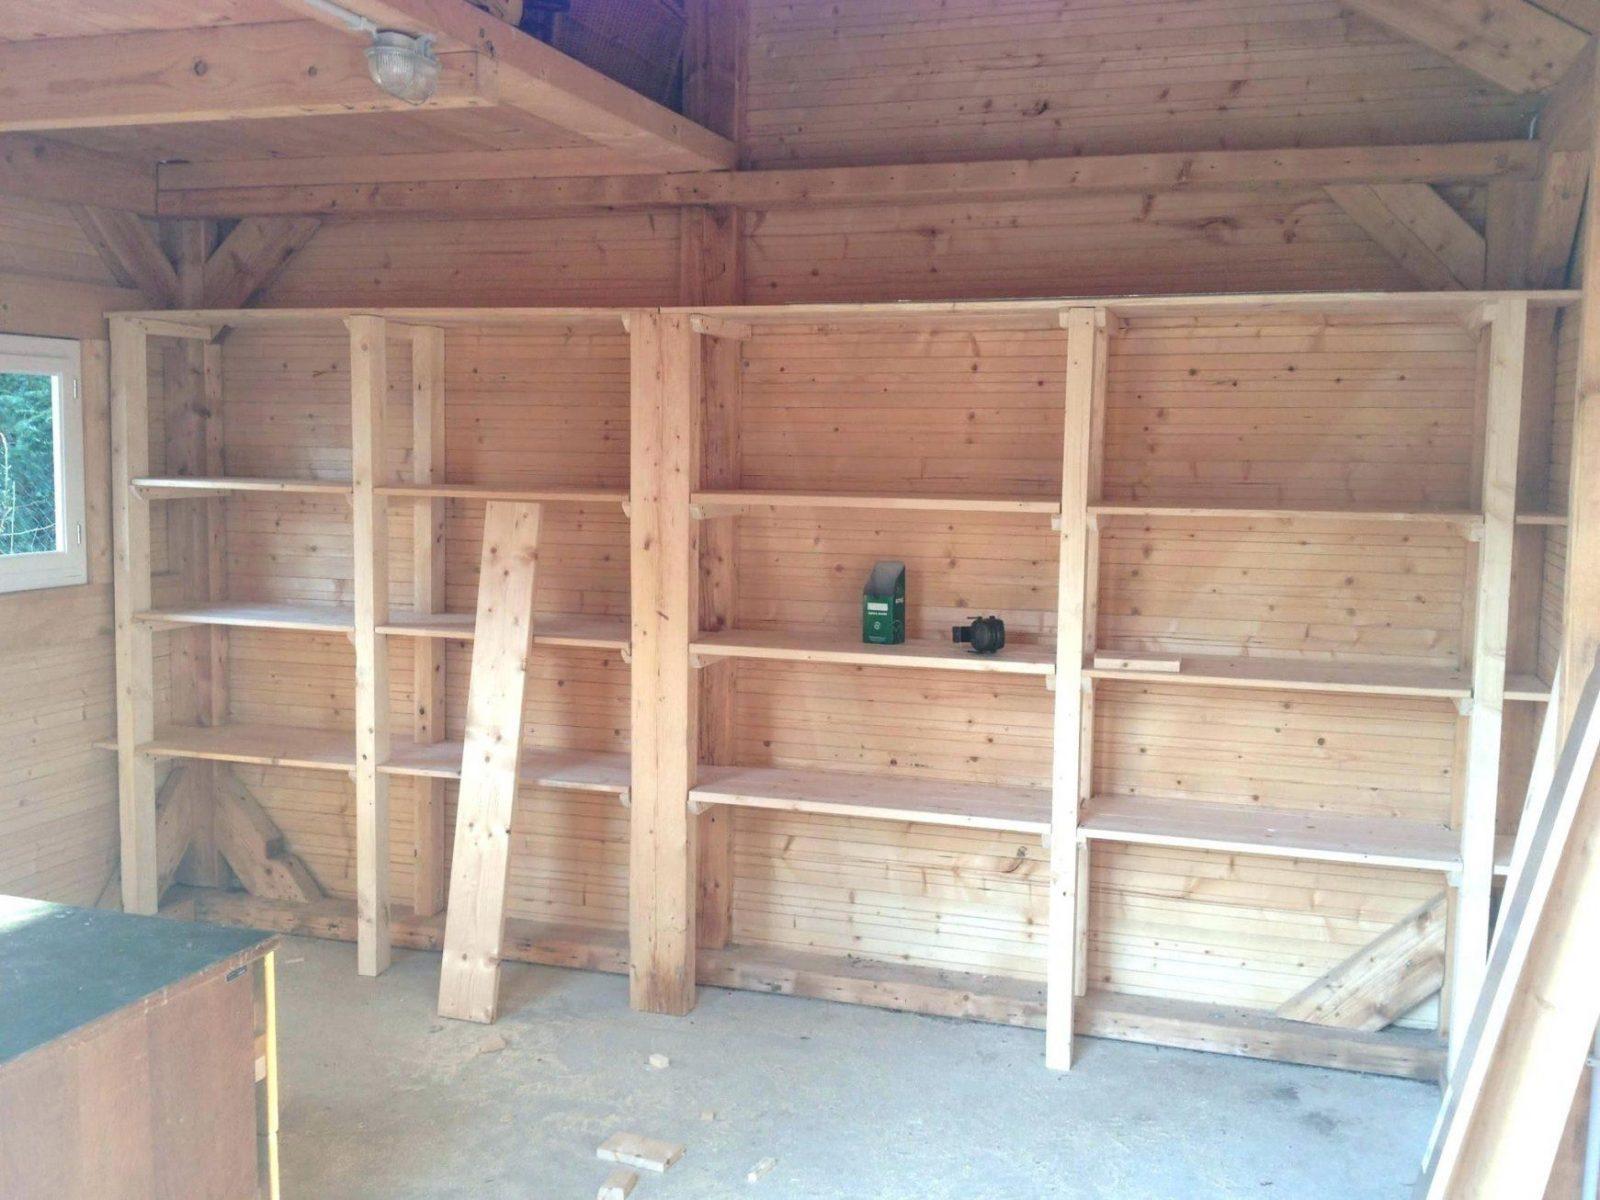 gertehaus selber bauen bauplan good gertehaus selber bauen bauplan with gertehaus selber bauen. Black Bedroom Furniture Sets. Home Design Ideas